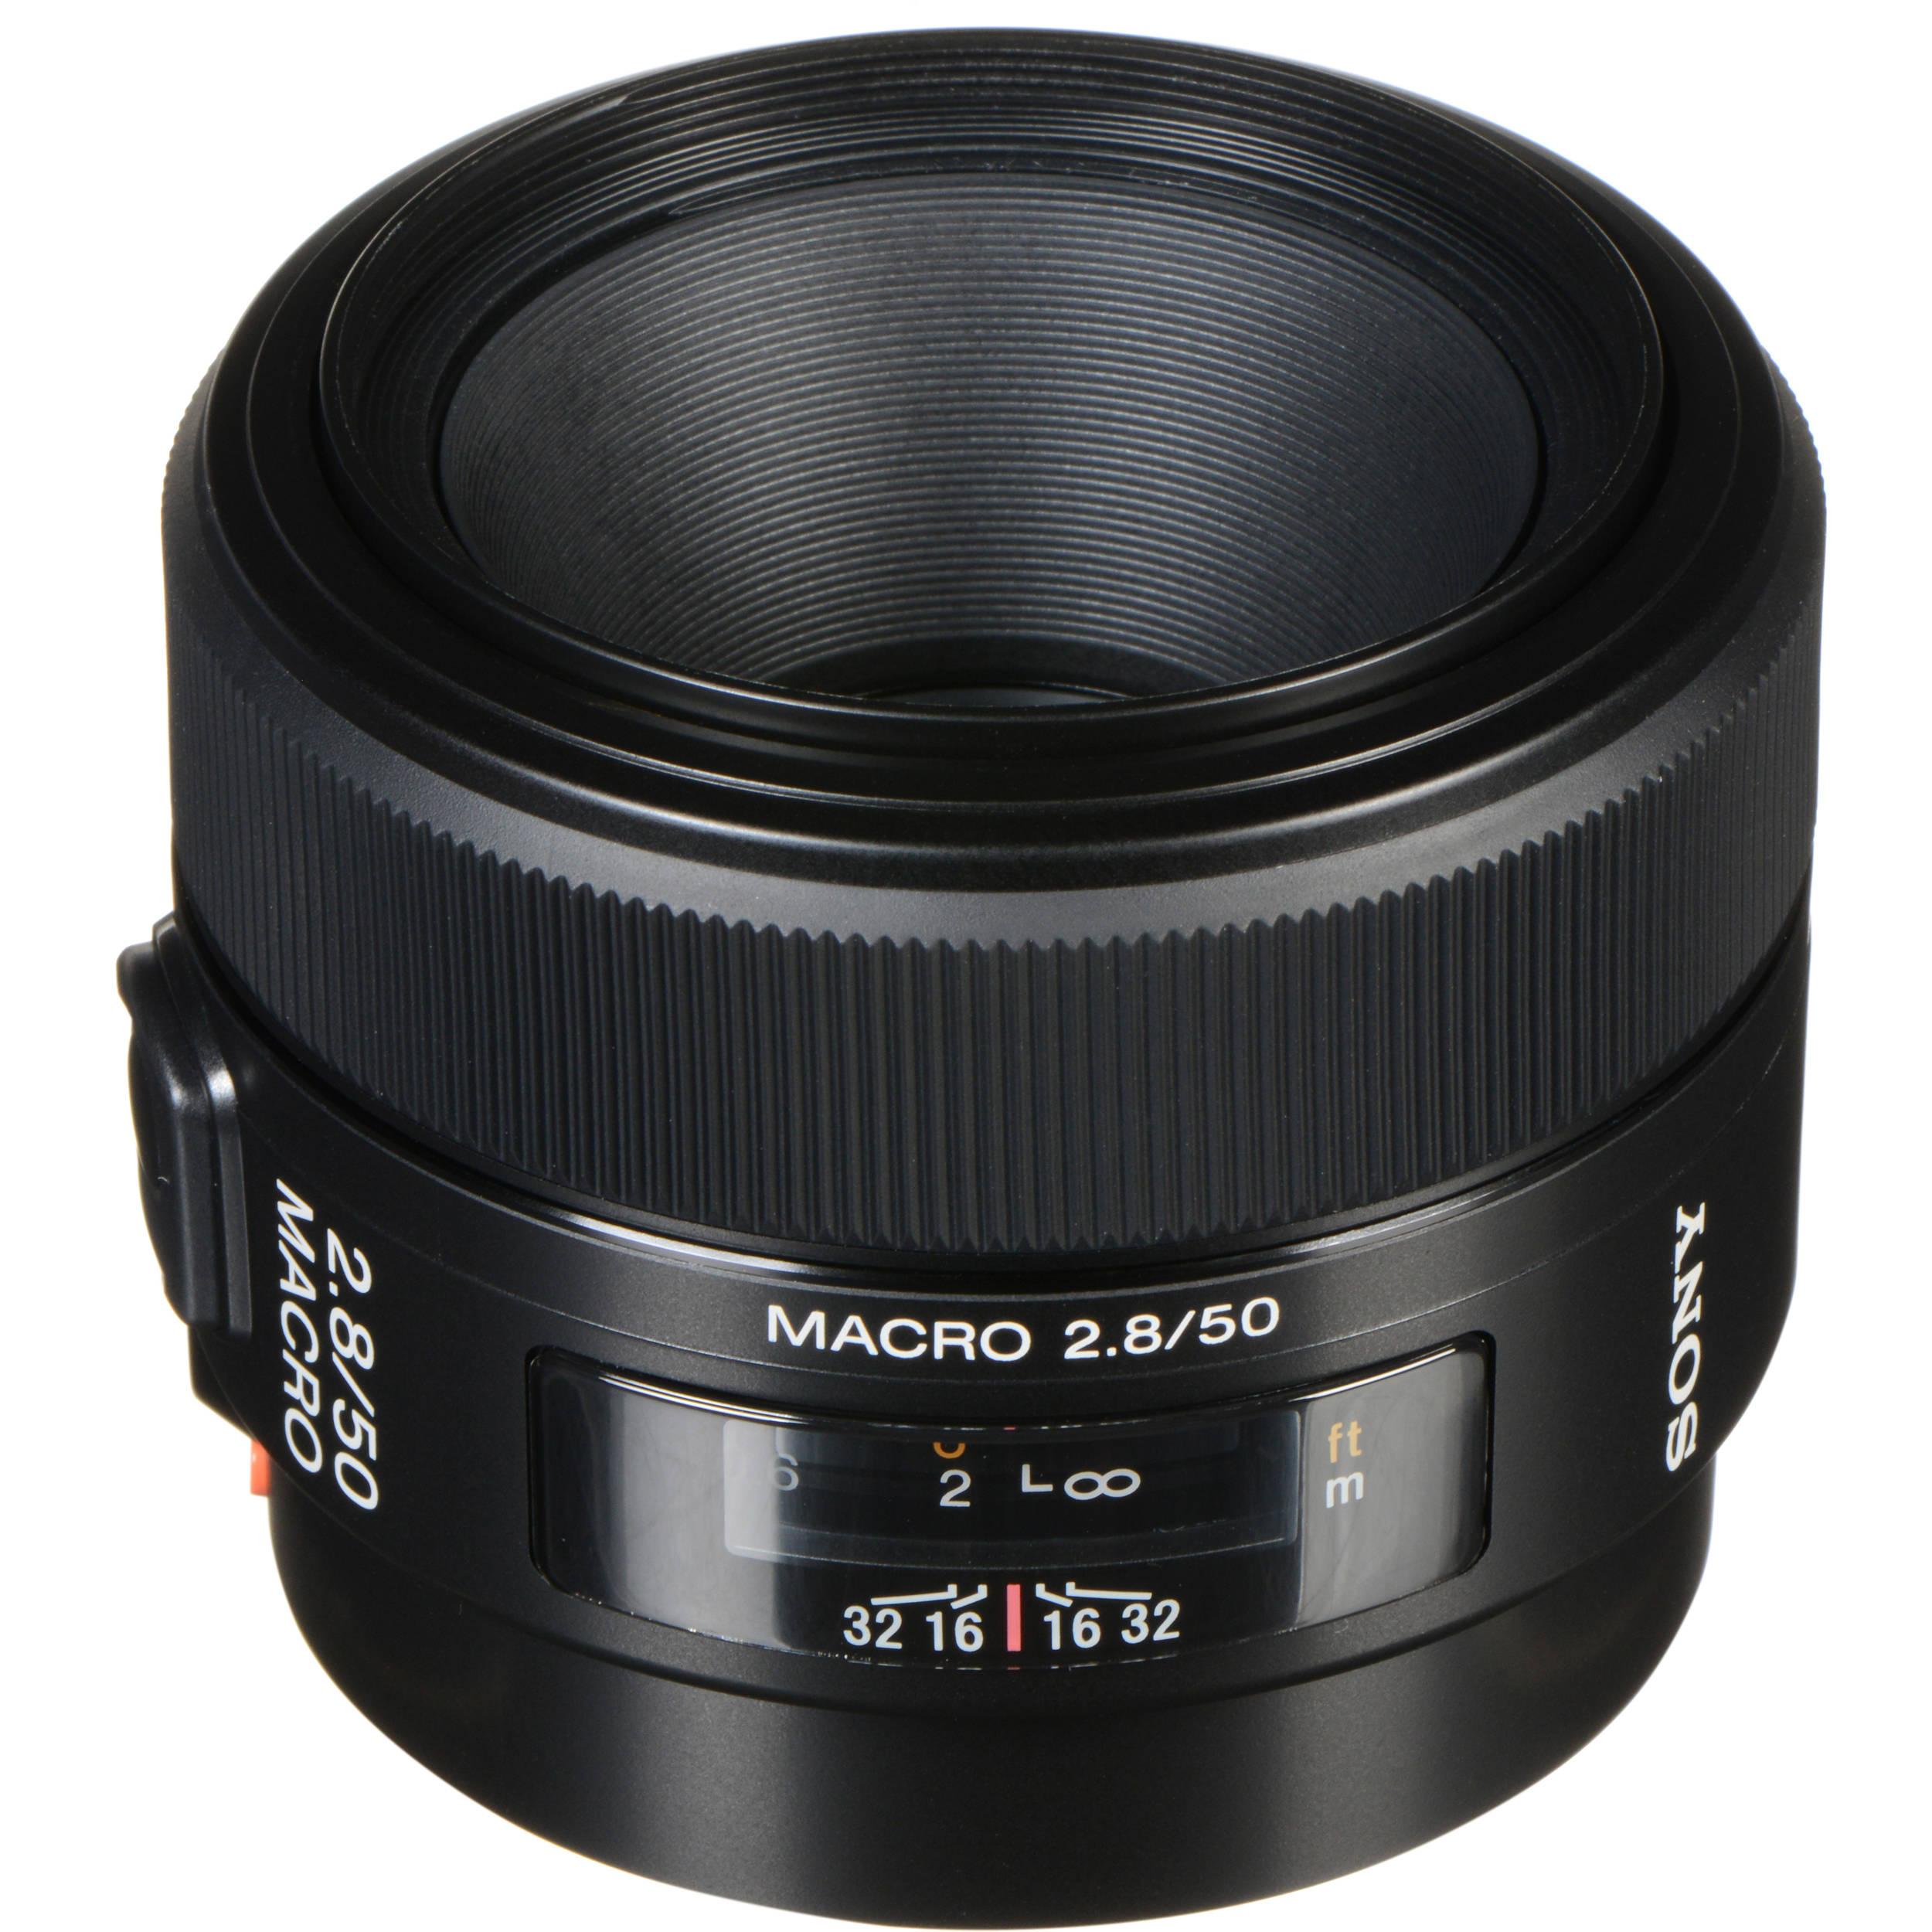 Sony 50mm f/2.8 Macro Lens SAL50M28 B&H Photo Video